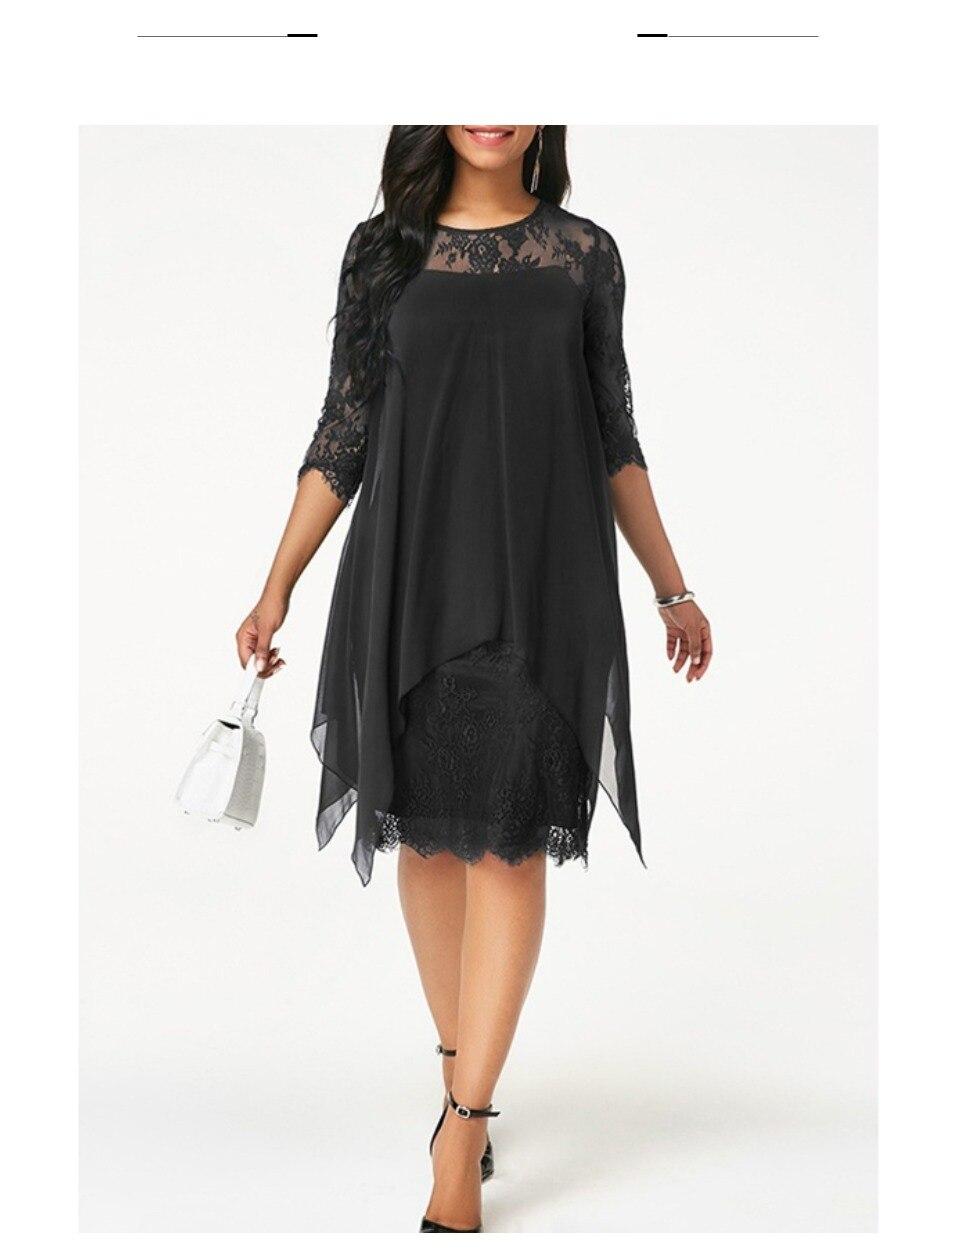 43bd9e8403 Flash Sale] Plus Size Chiffon Dresses Women New Fashion Chiffon ...